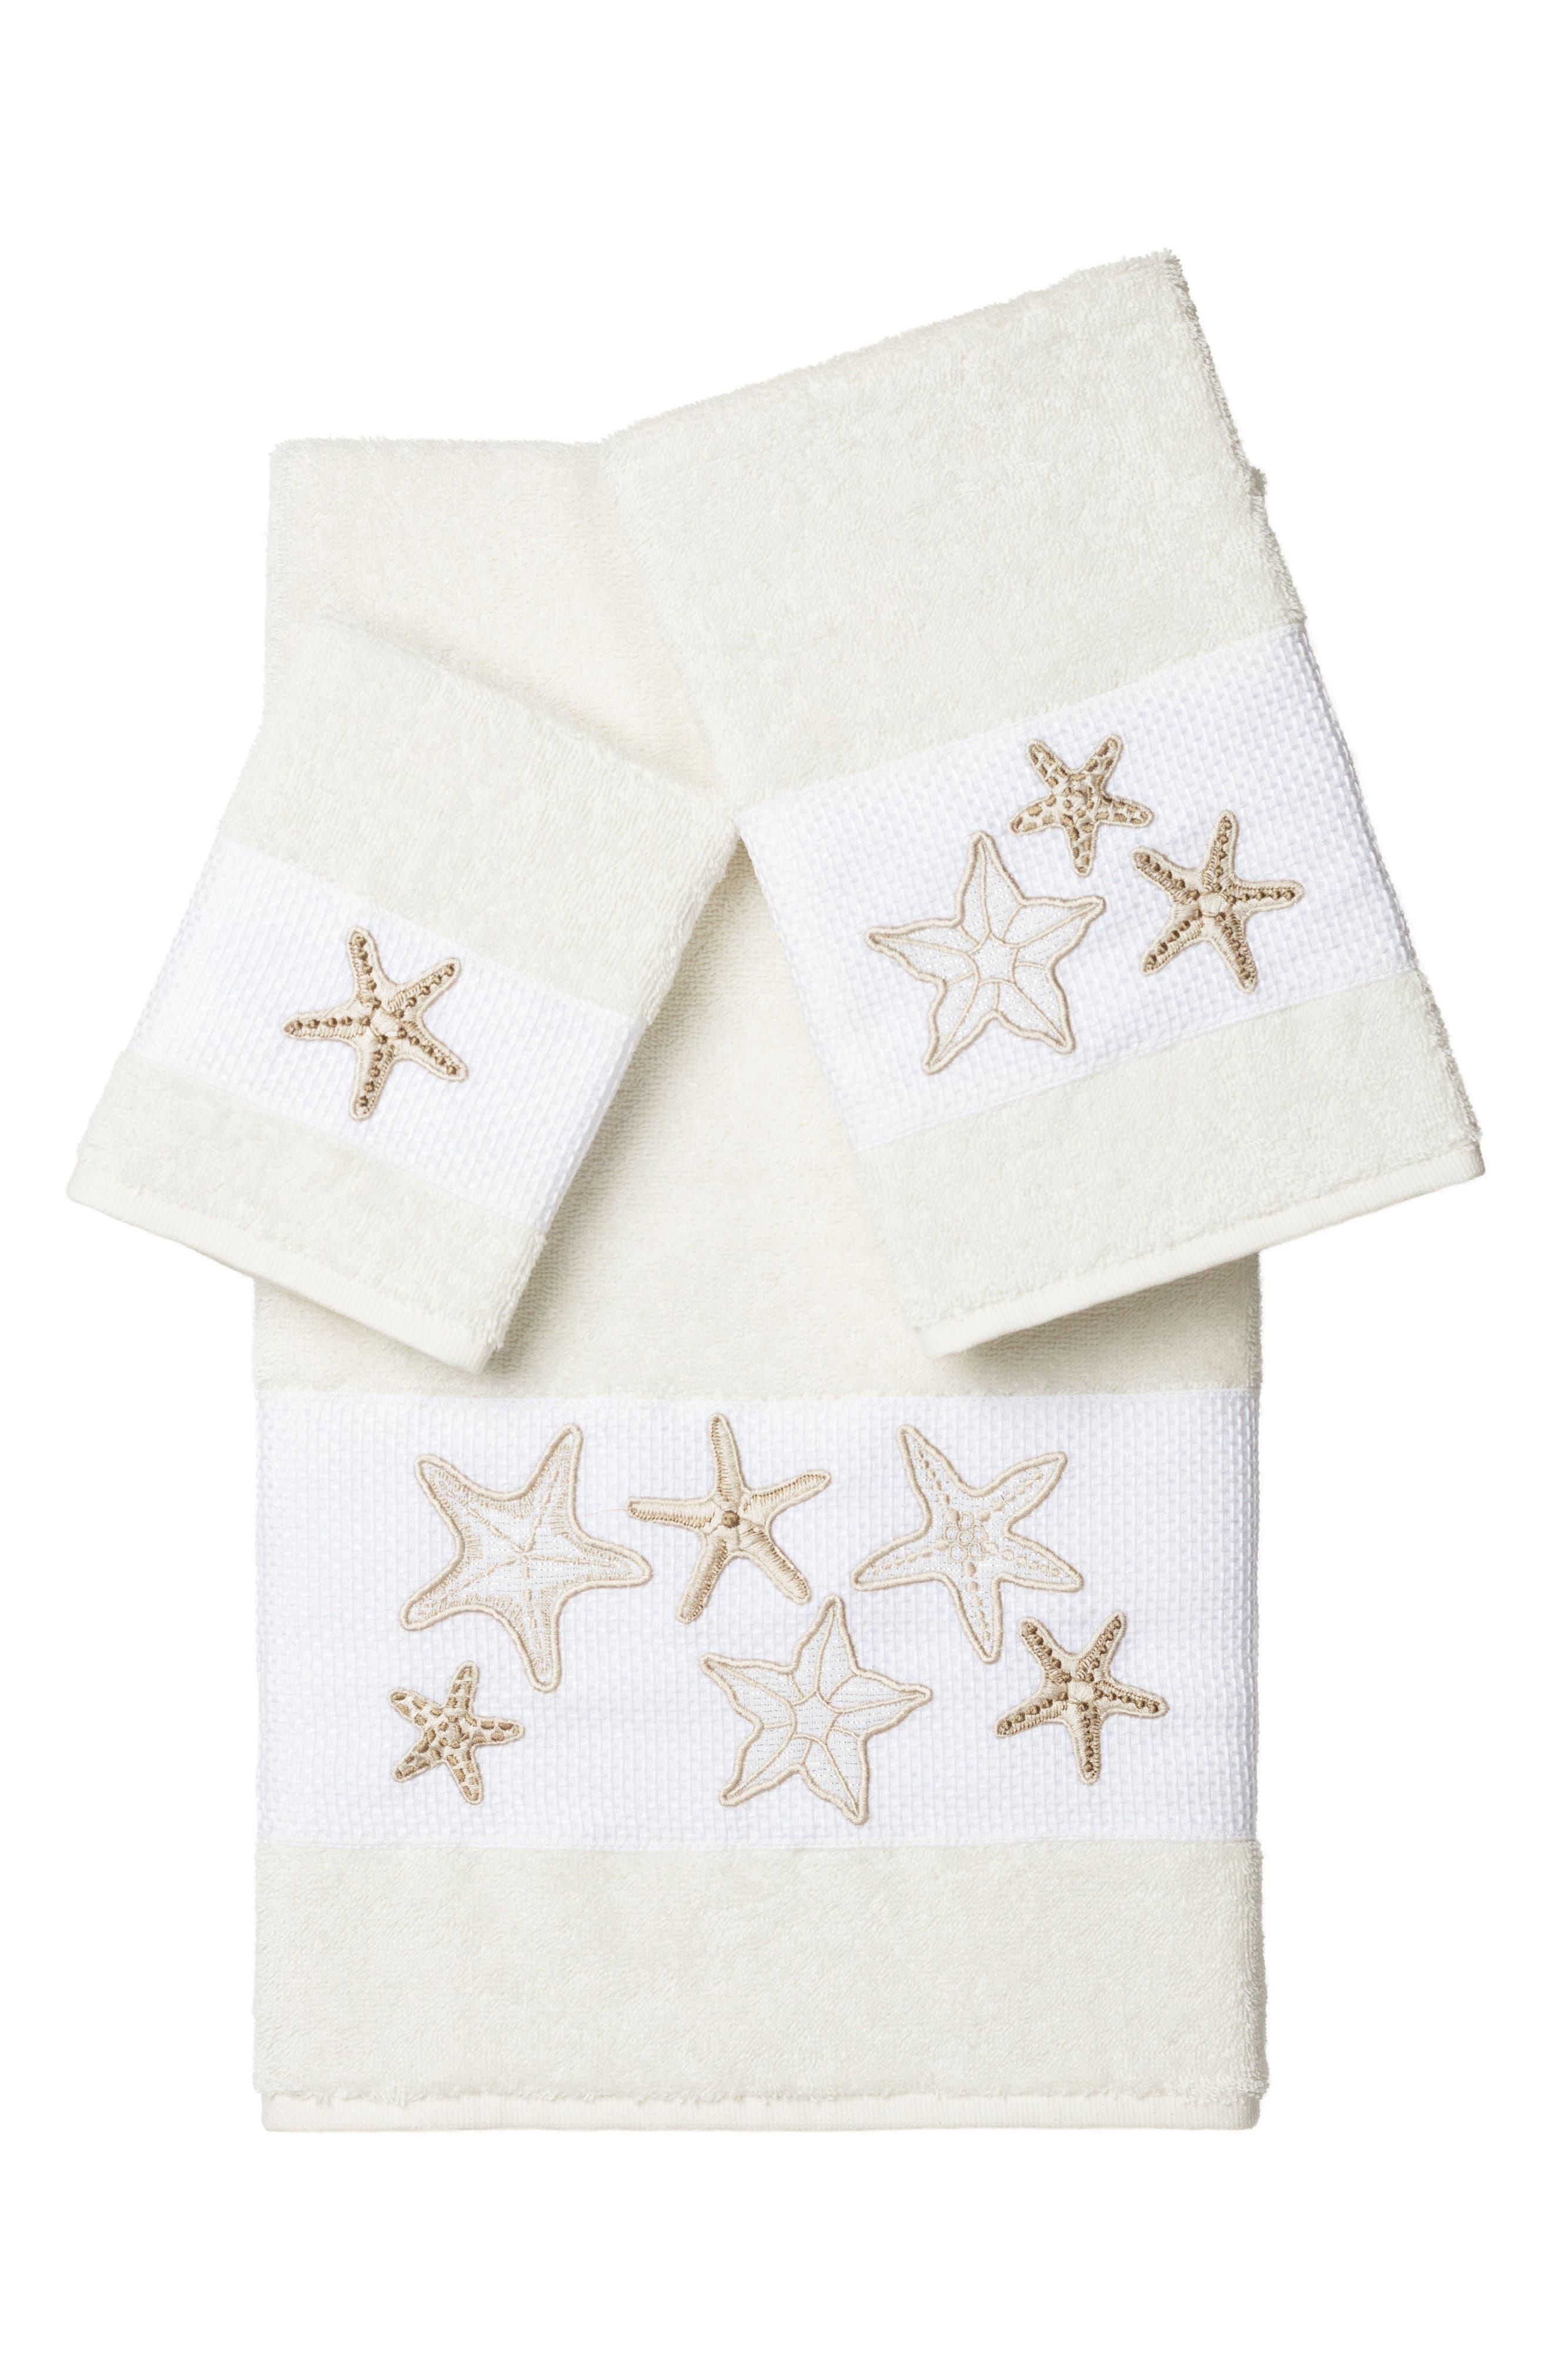 Lydia 3-Piece Turkish Cotton Towel Set,                             Main thumbnail 1, color,                             Cream